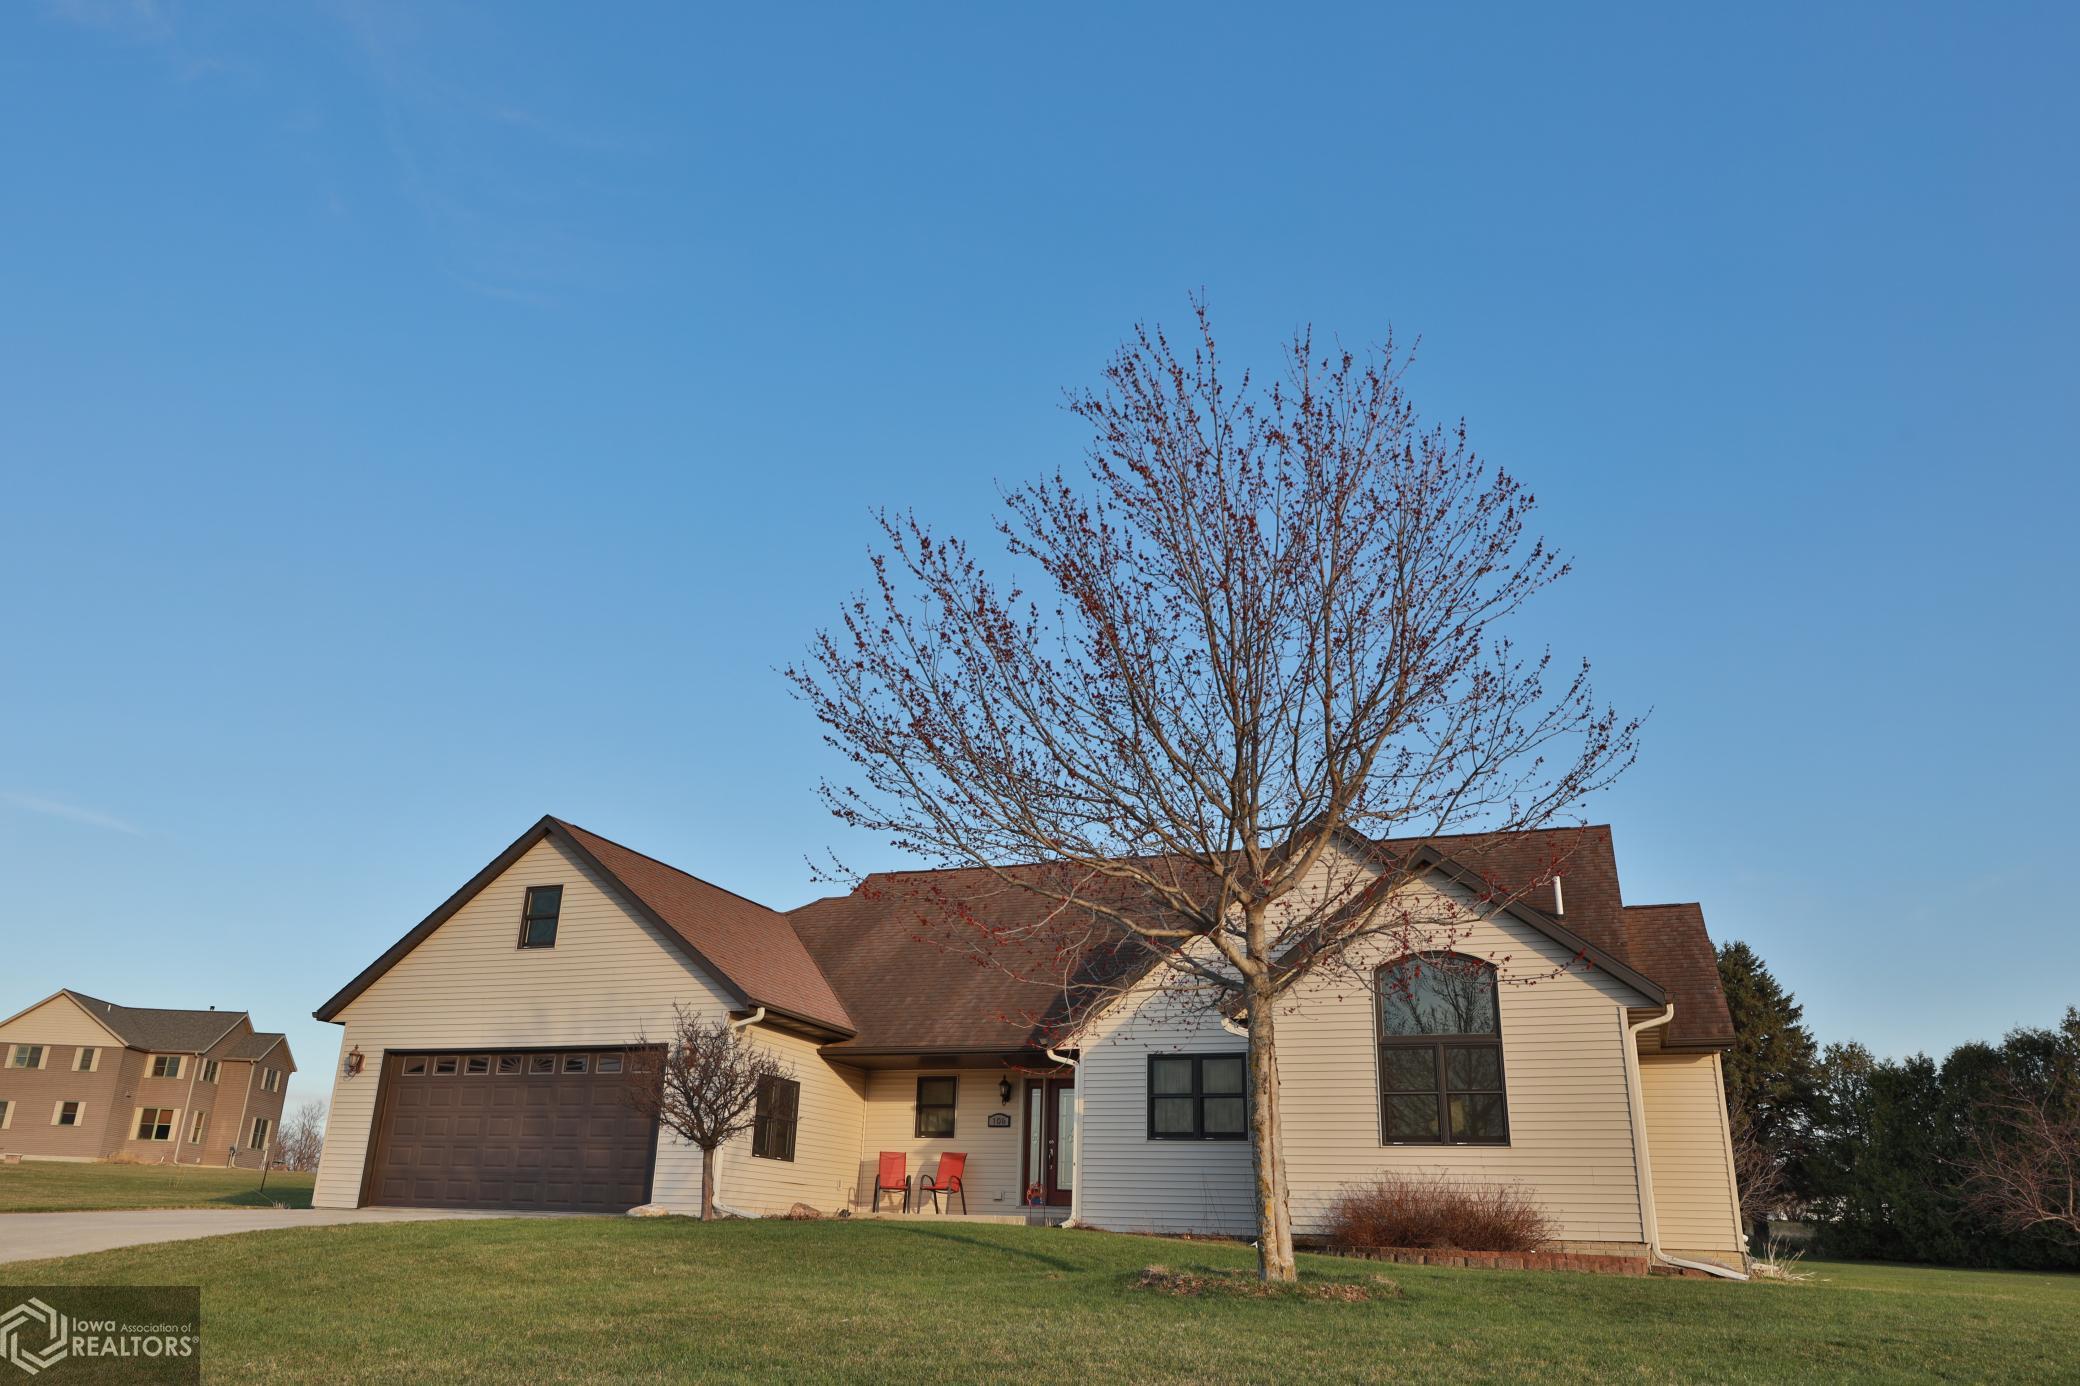 105 Link Circle, Brooklyn, Iowa 52211, 6 Bedrooms Bedrooms, ,2 BathroomsBathrooms,Single Family,For Sale,Link Circle,5733731